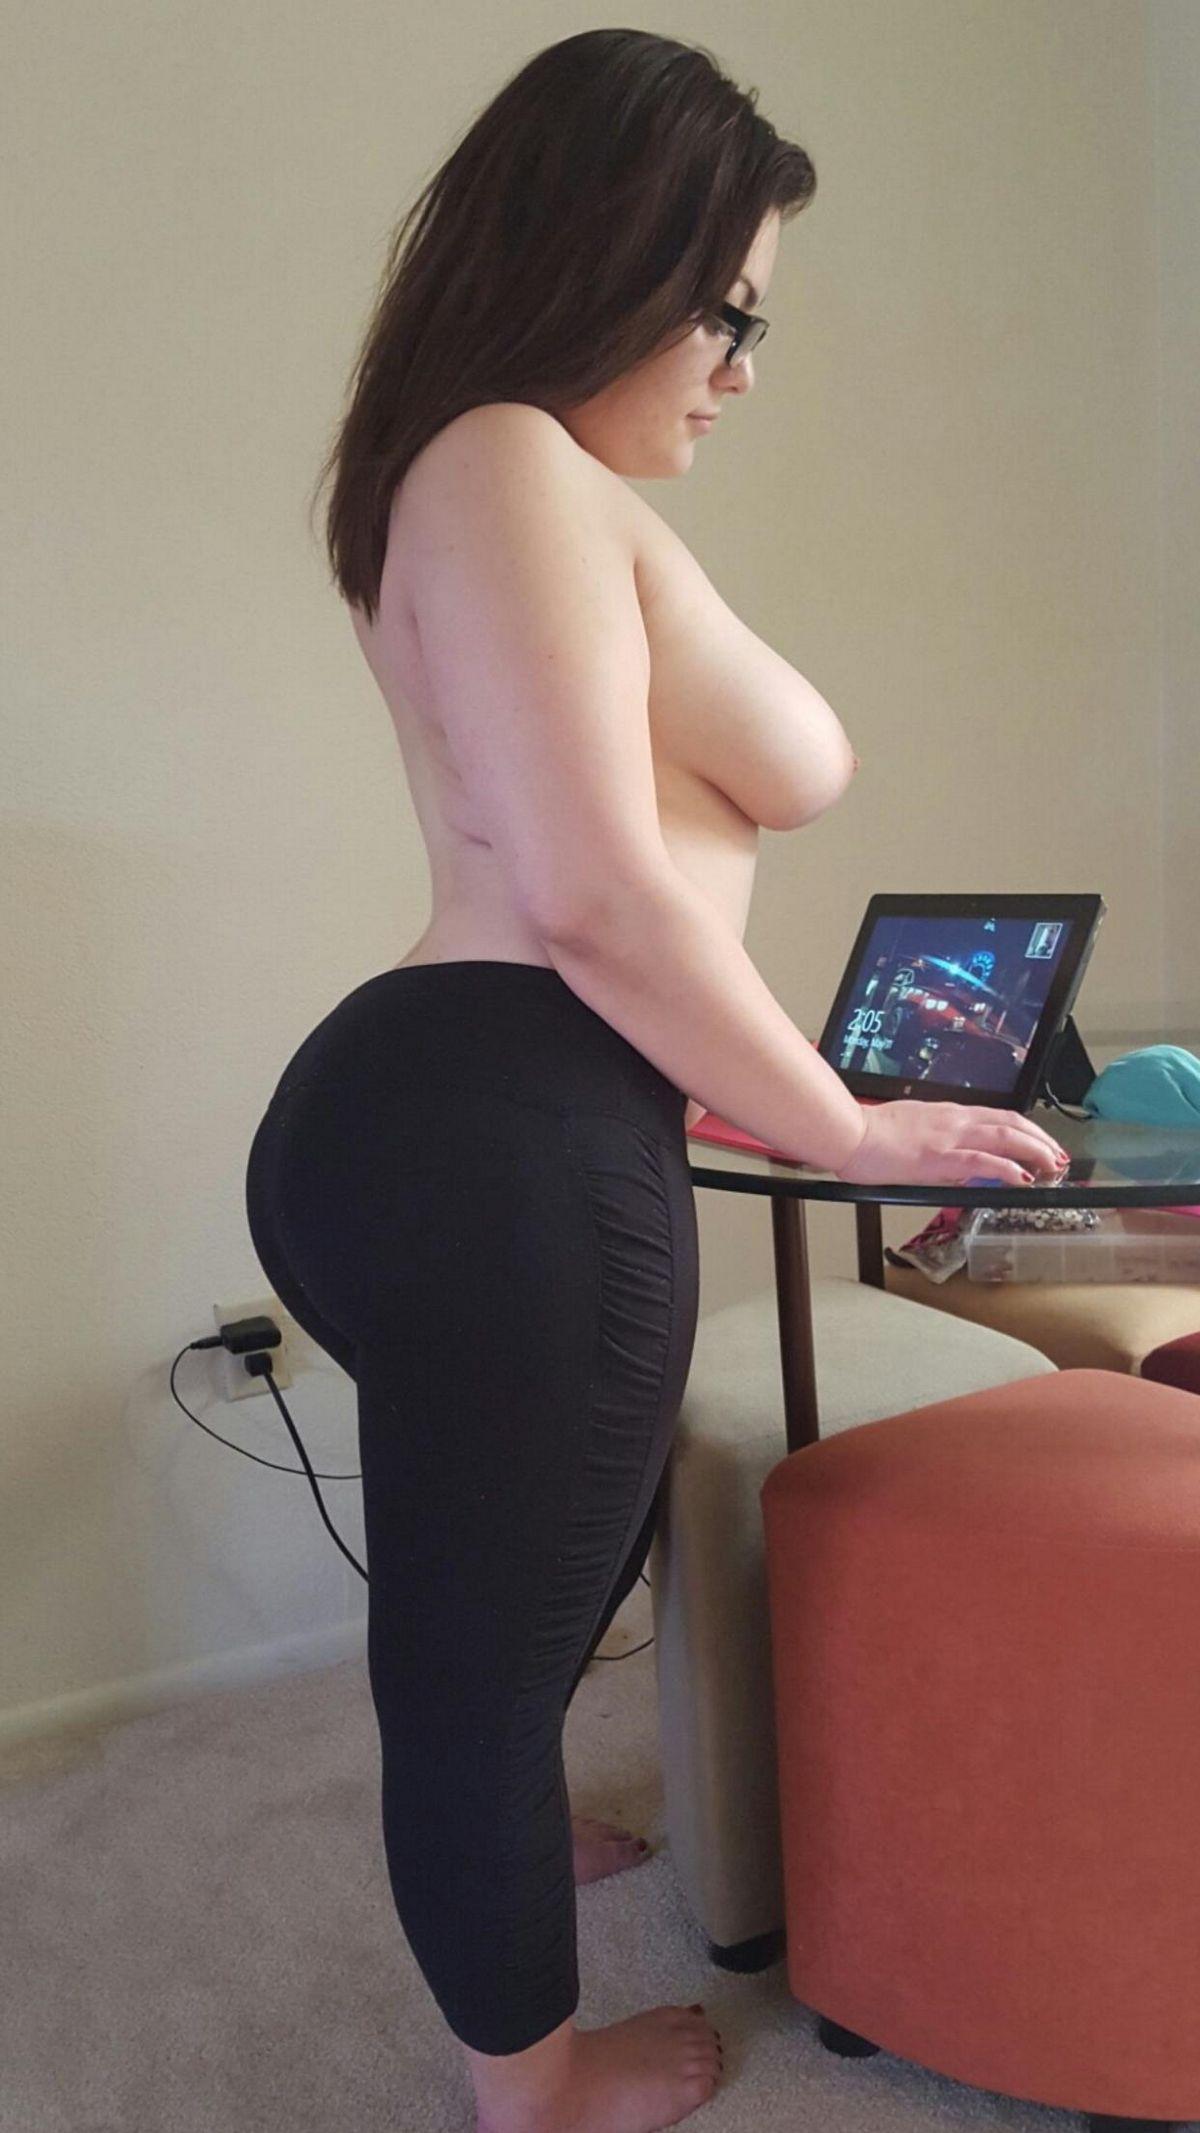 Сучки с жирком на теле снимают одежду перед объективом. Порно жирок.